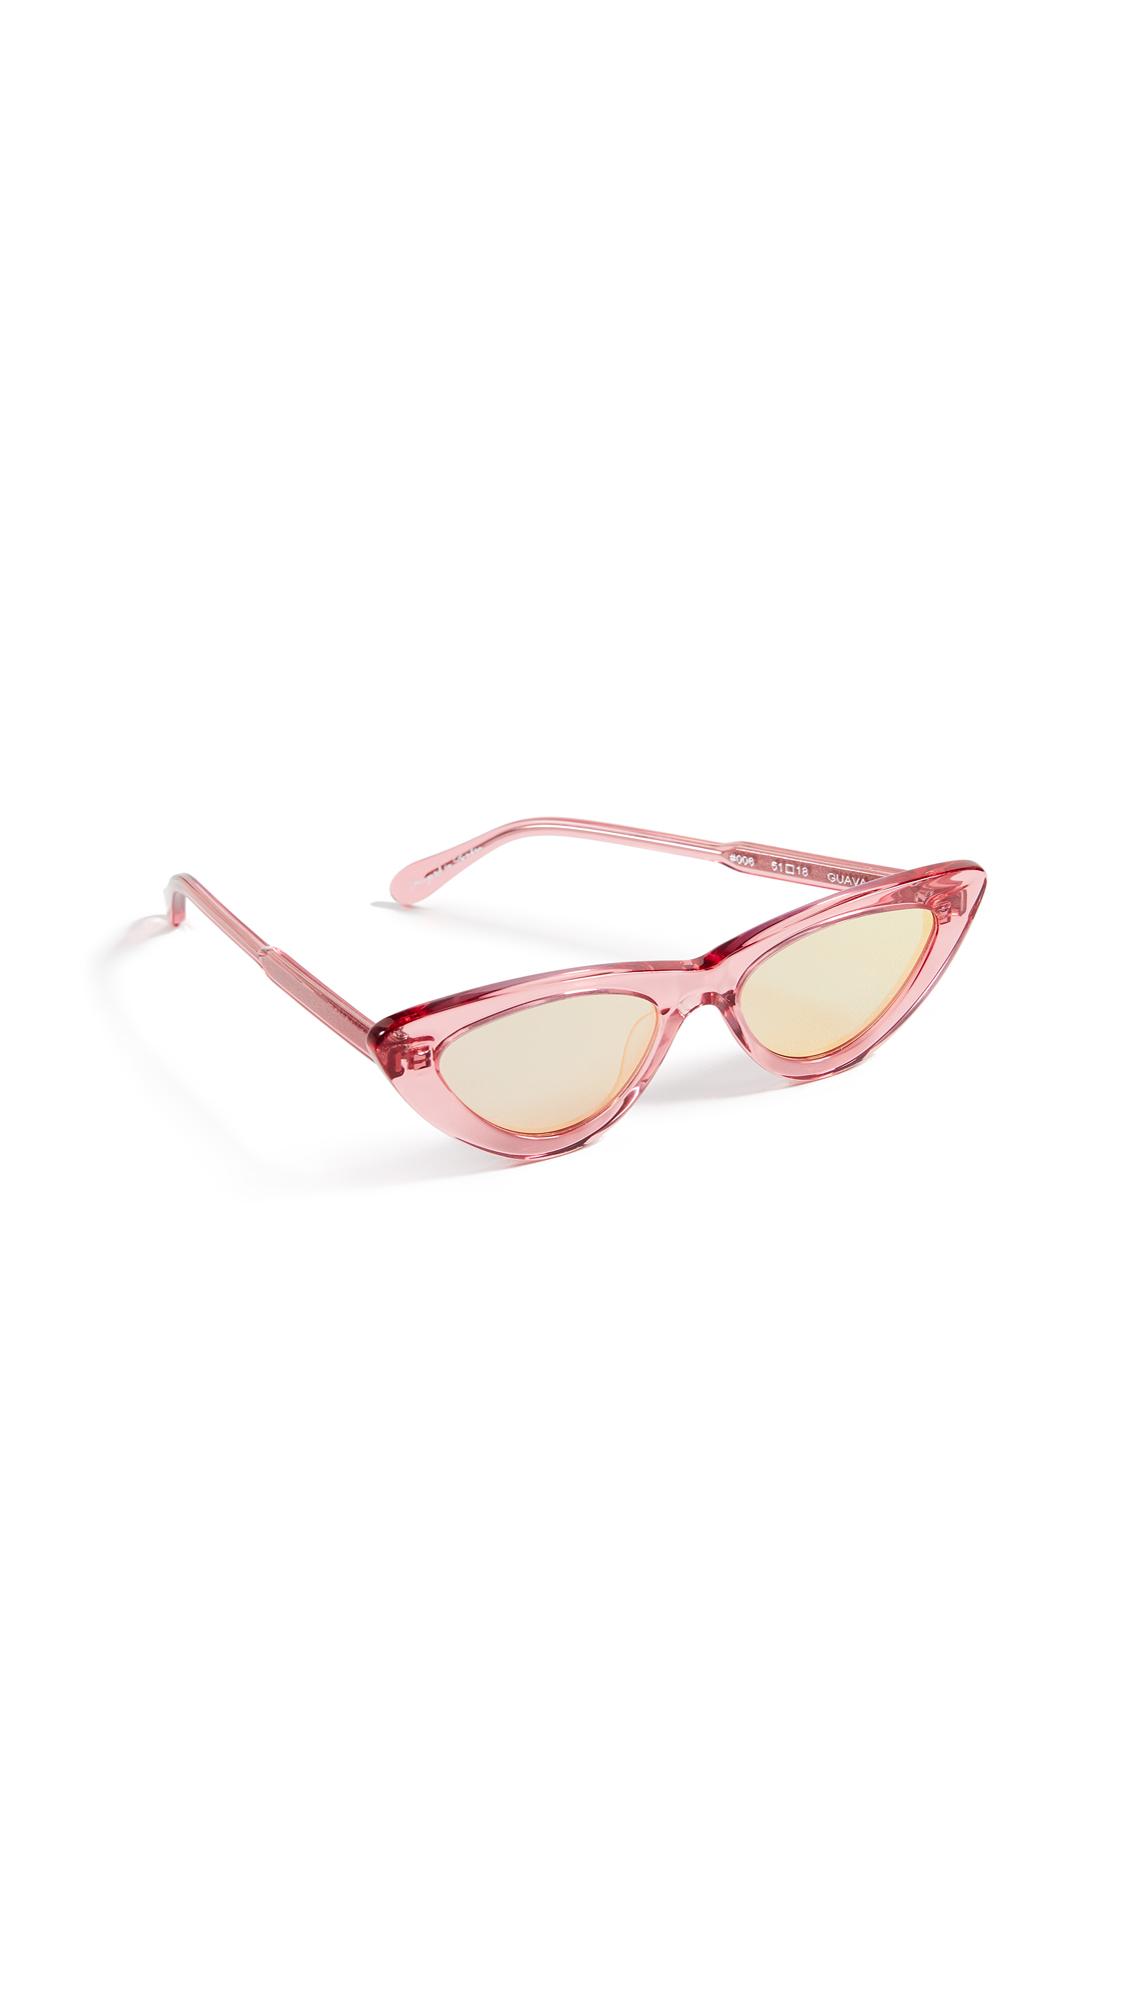 295976e36e Chimi 006 Sunglasses